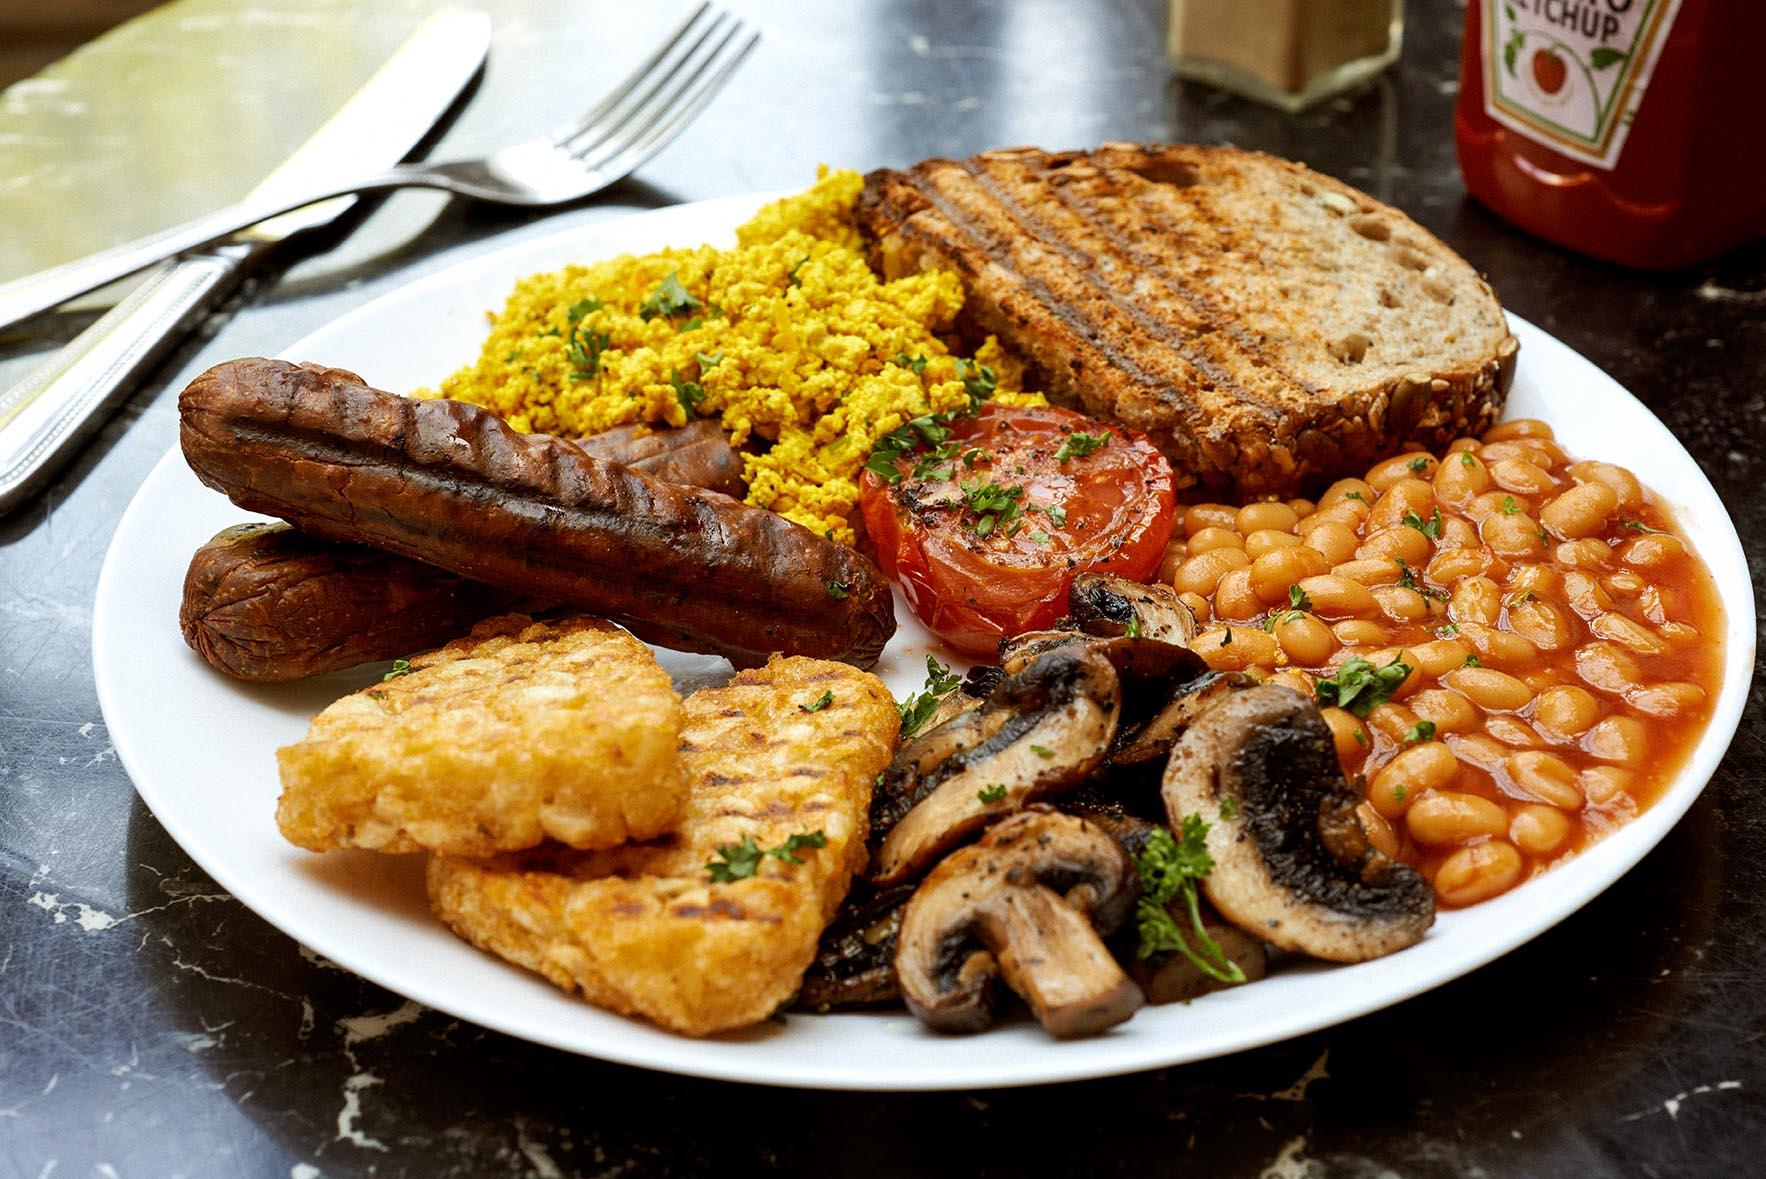 Vegan full English at The Gallery Cafe |Courtesy ofAmanda Stockley